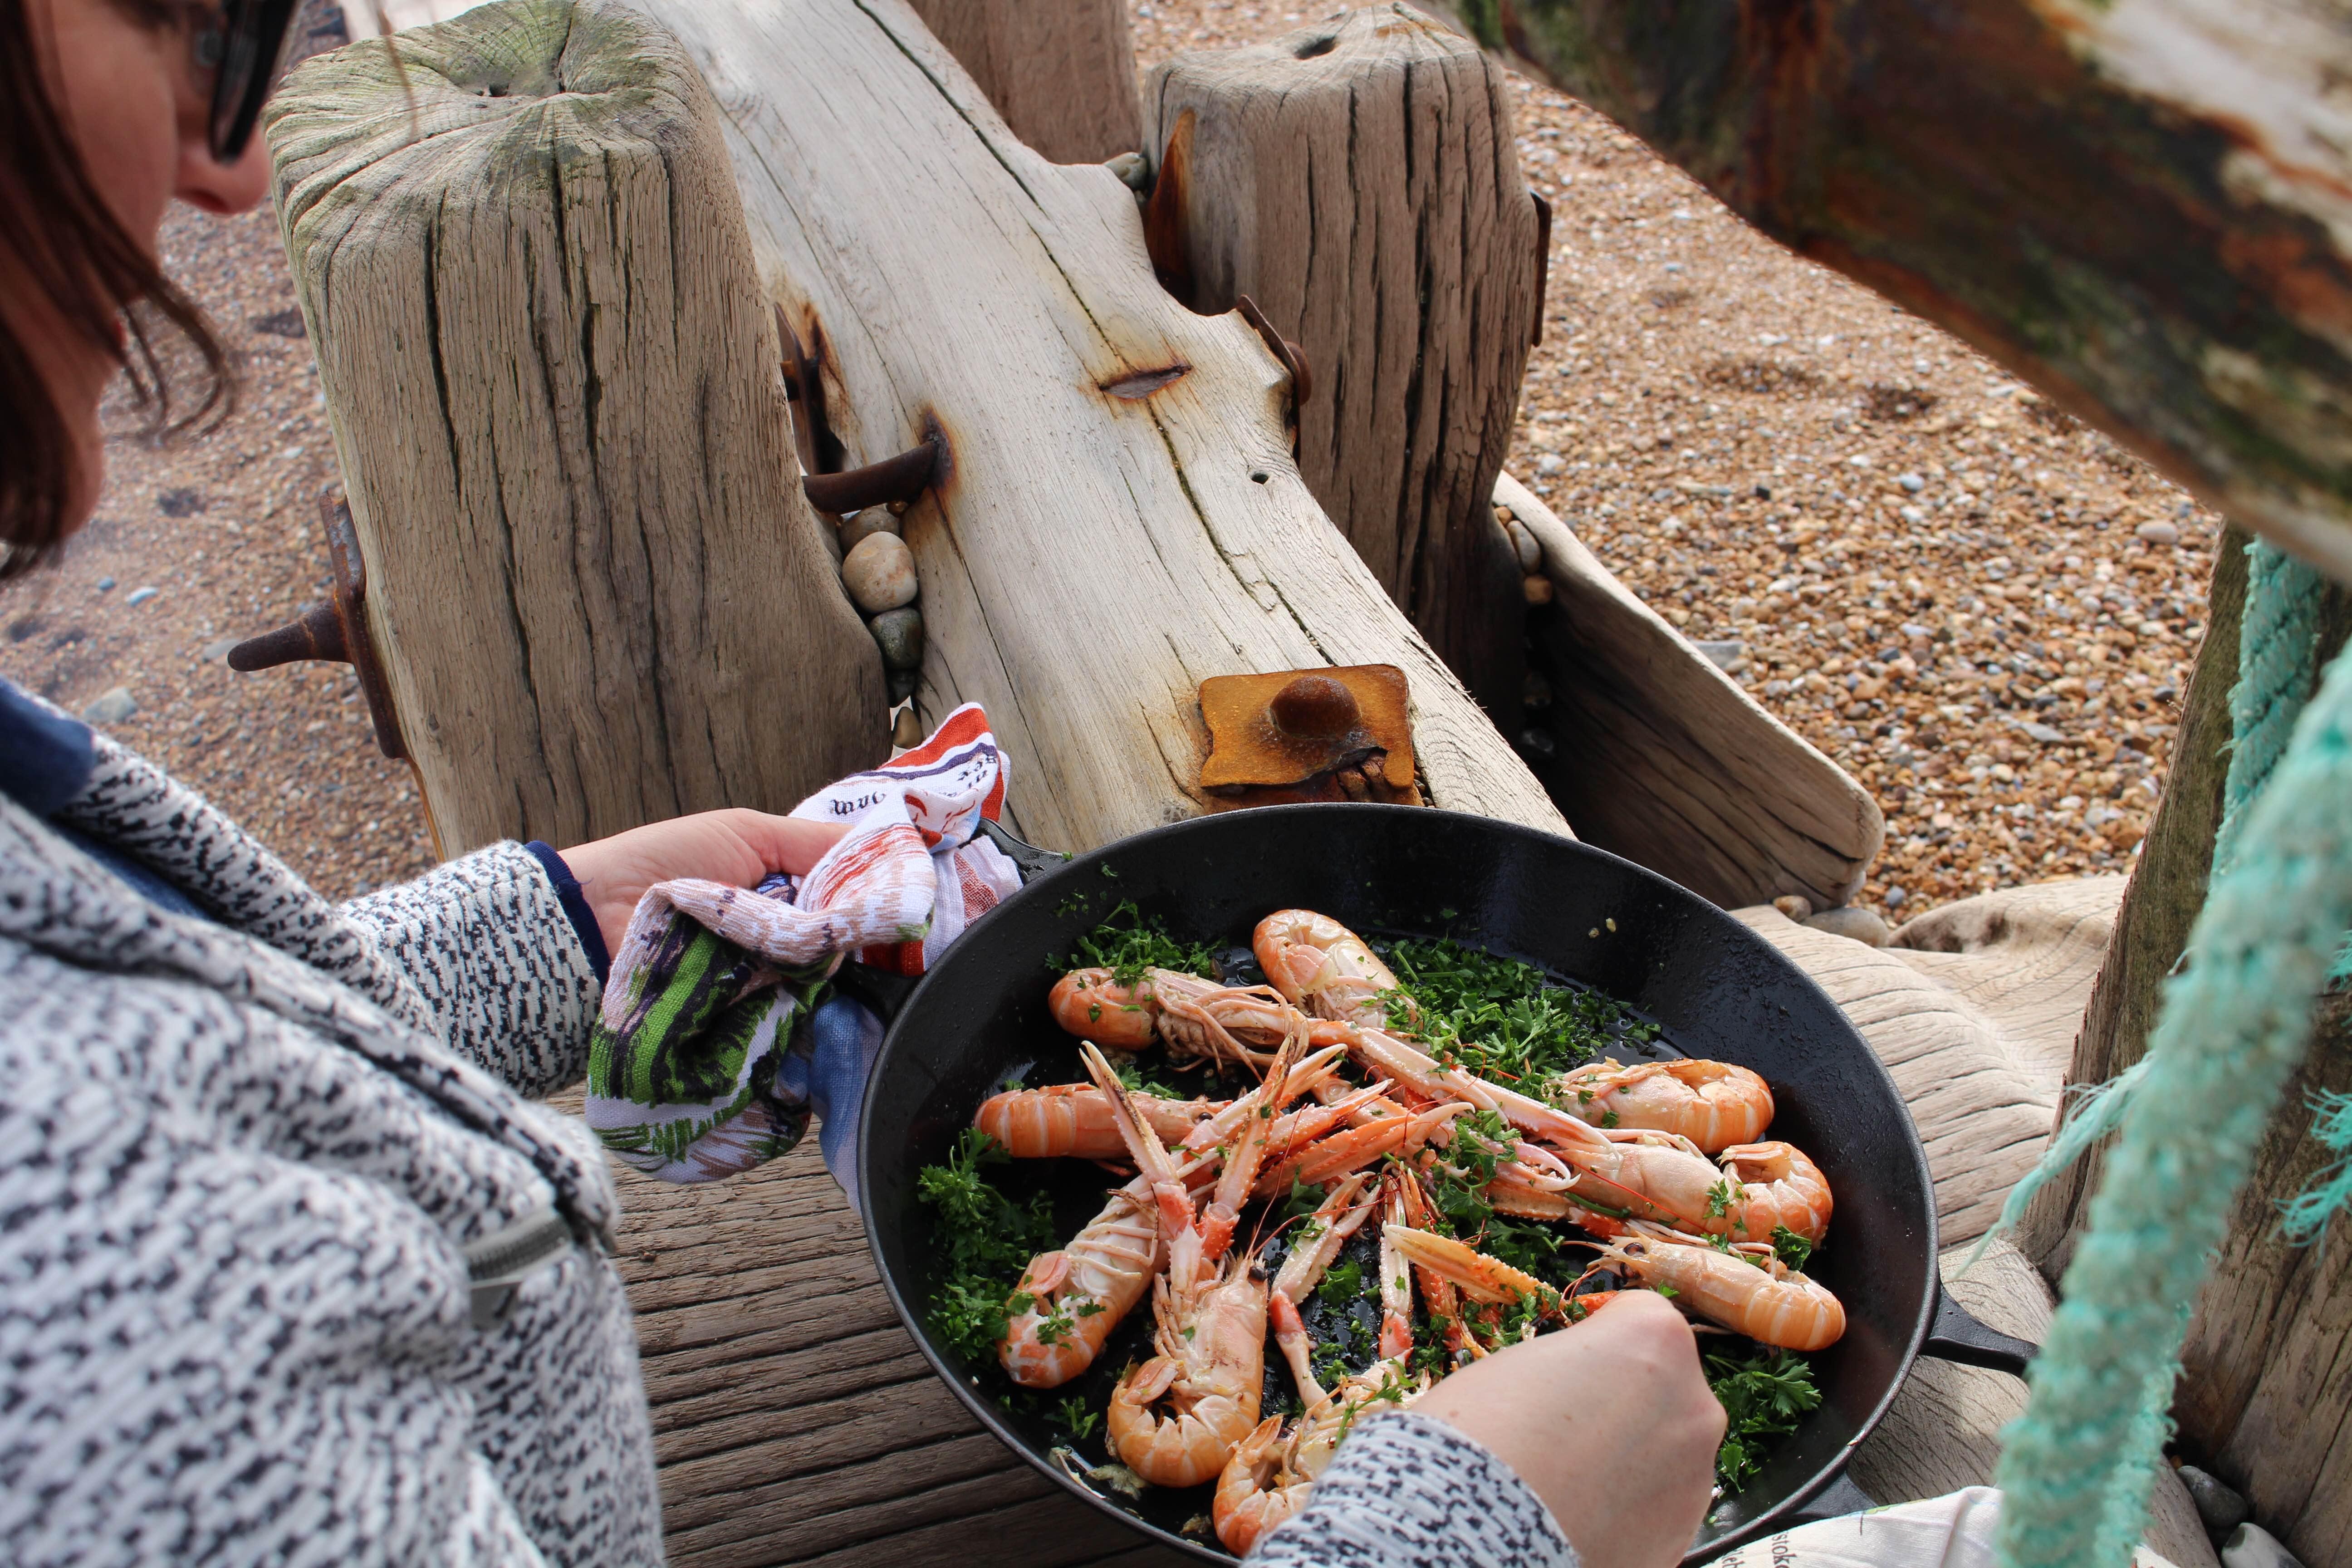 Beachhutcook Houseology Beach Cooking using a Le Creuset Paella Dish